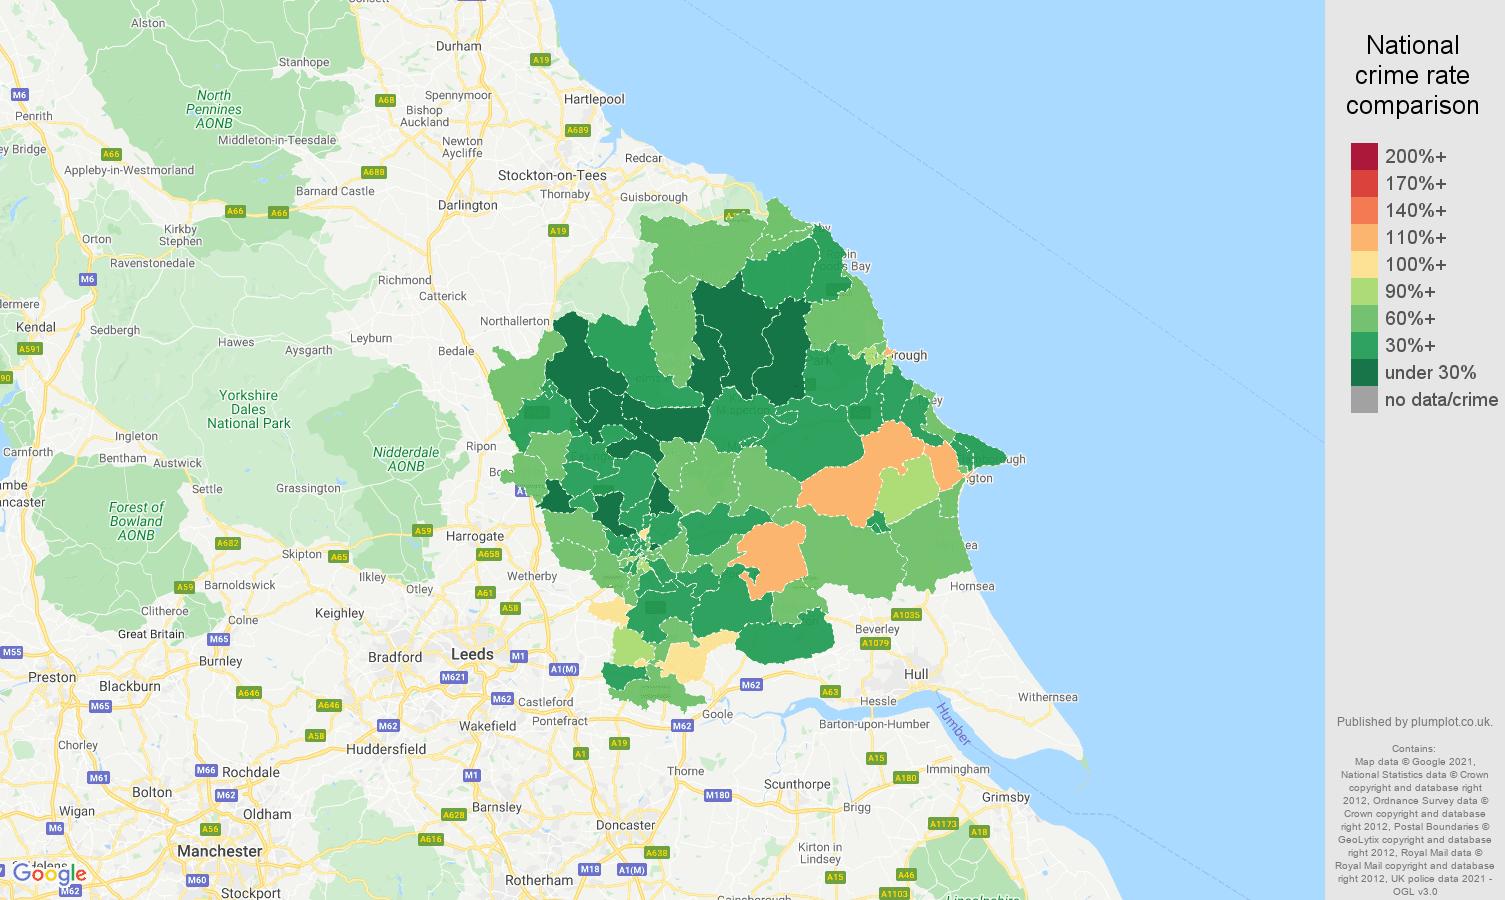 York burglary crime rate comparison map